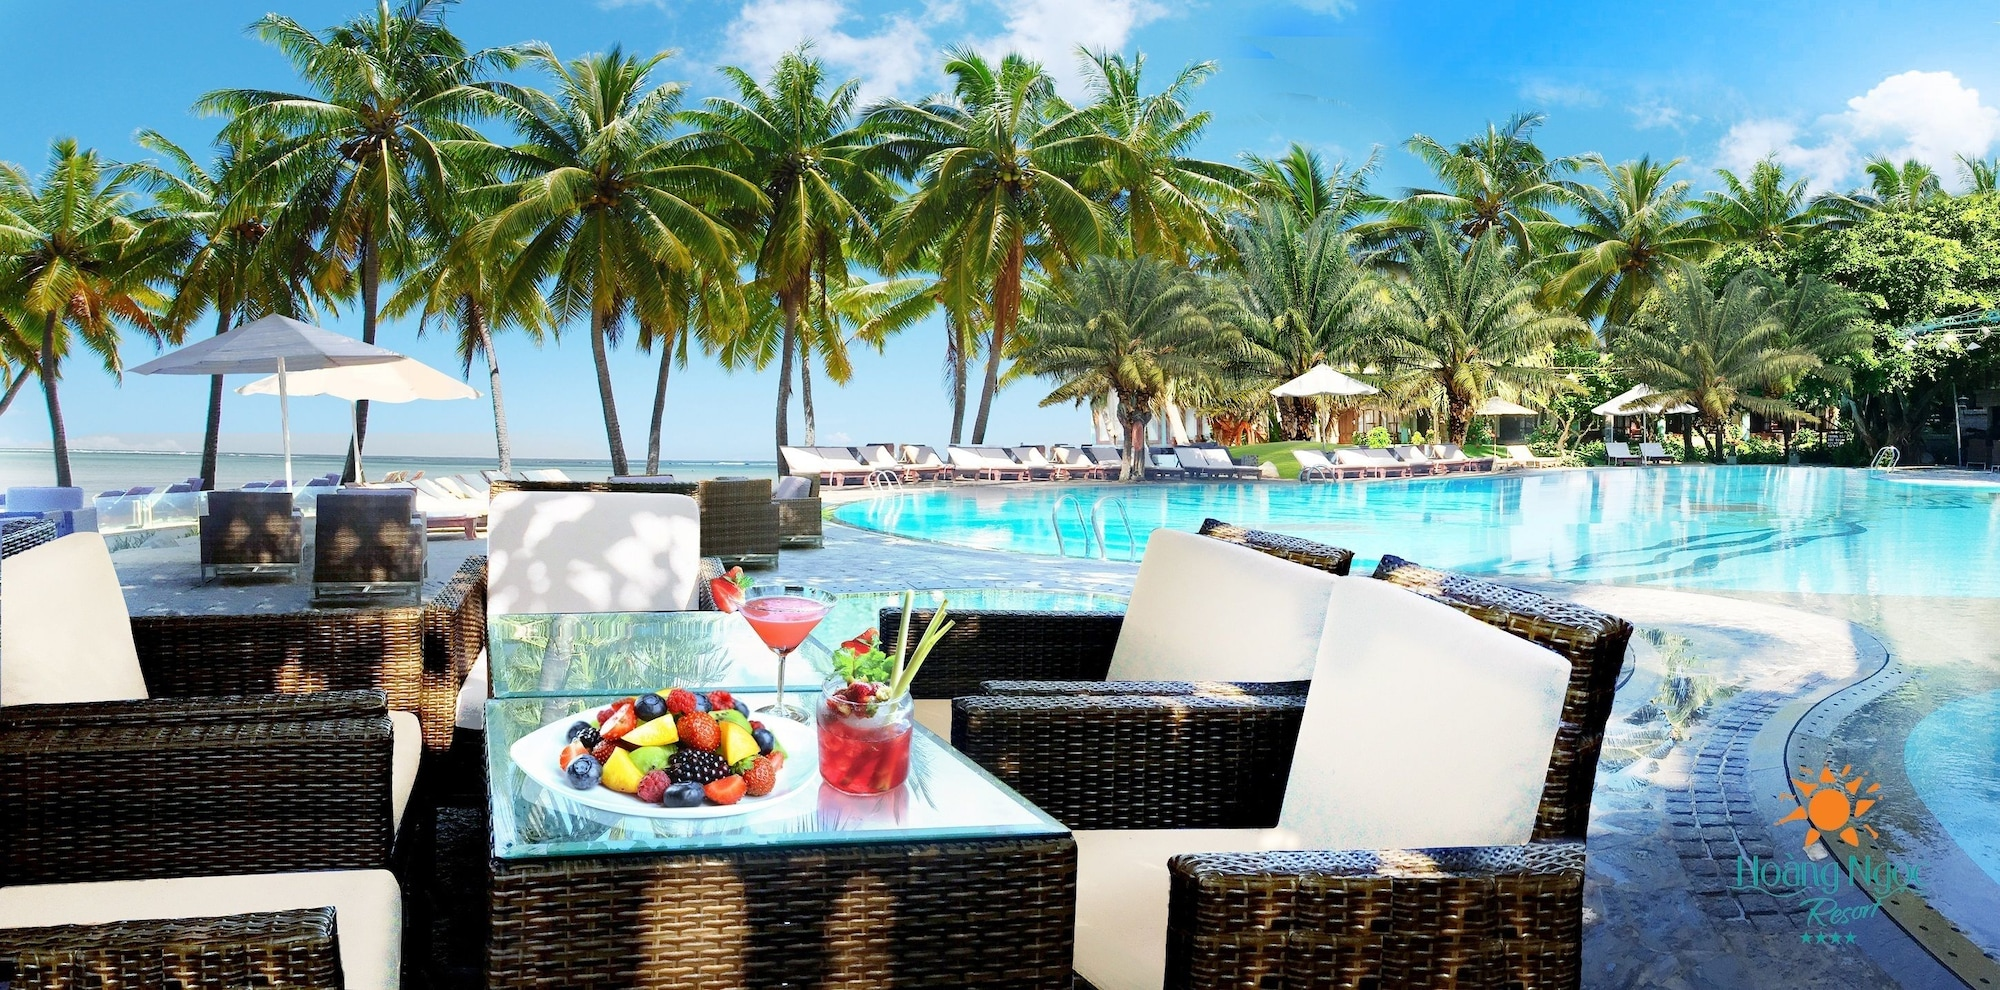 Hoang Ngoc Resort, Phan Thiết